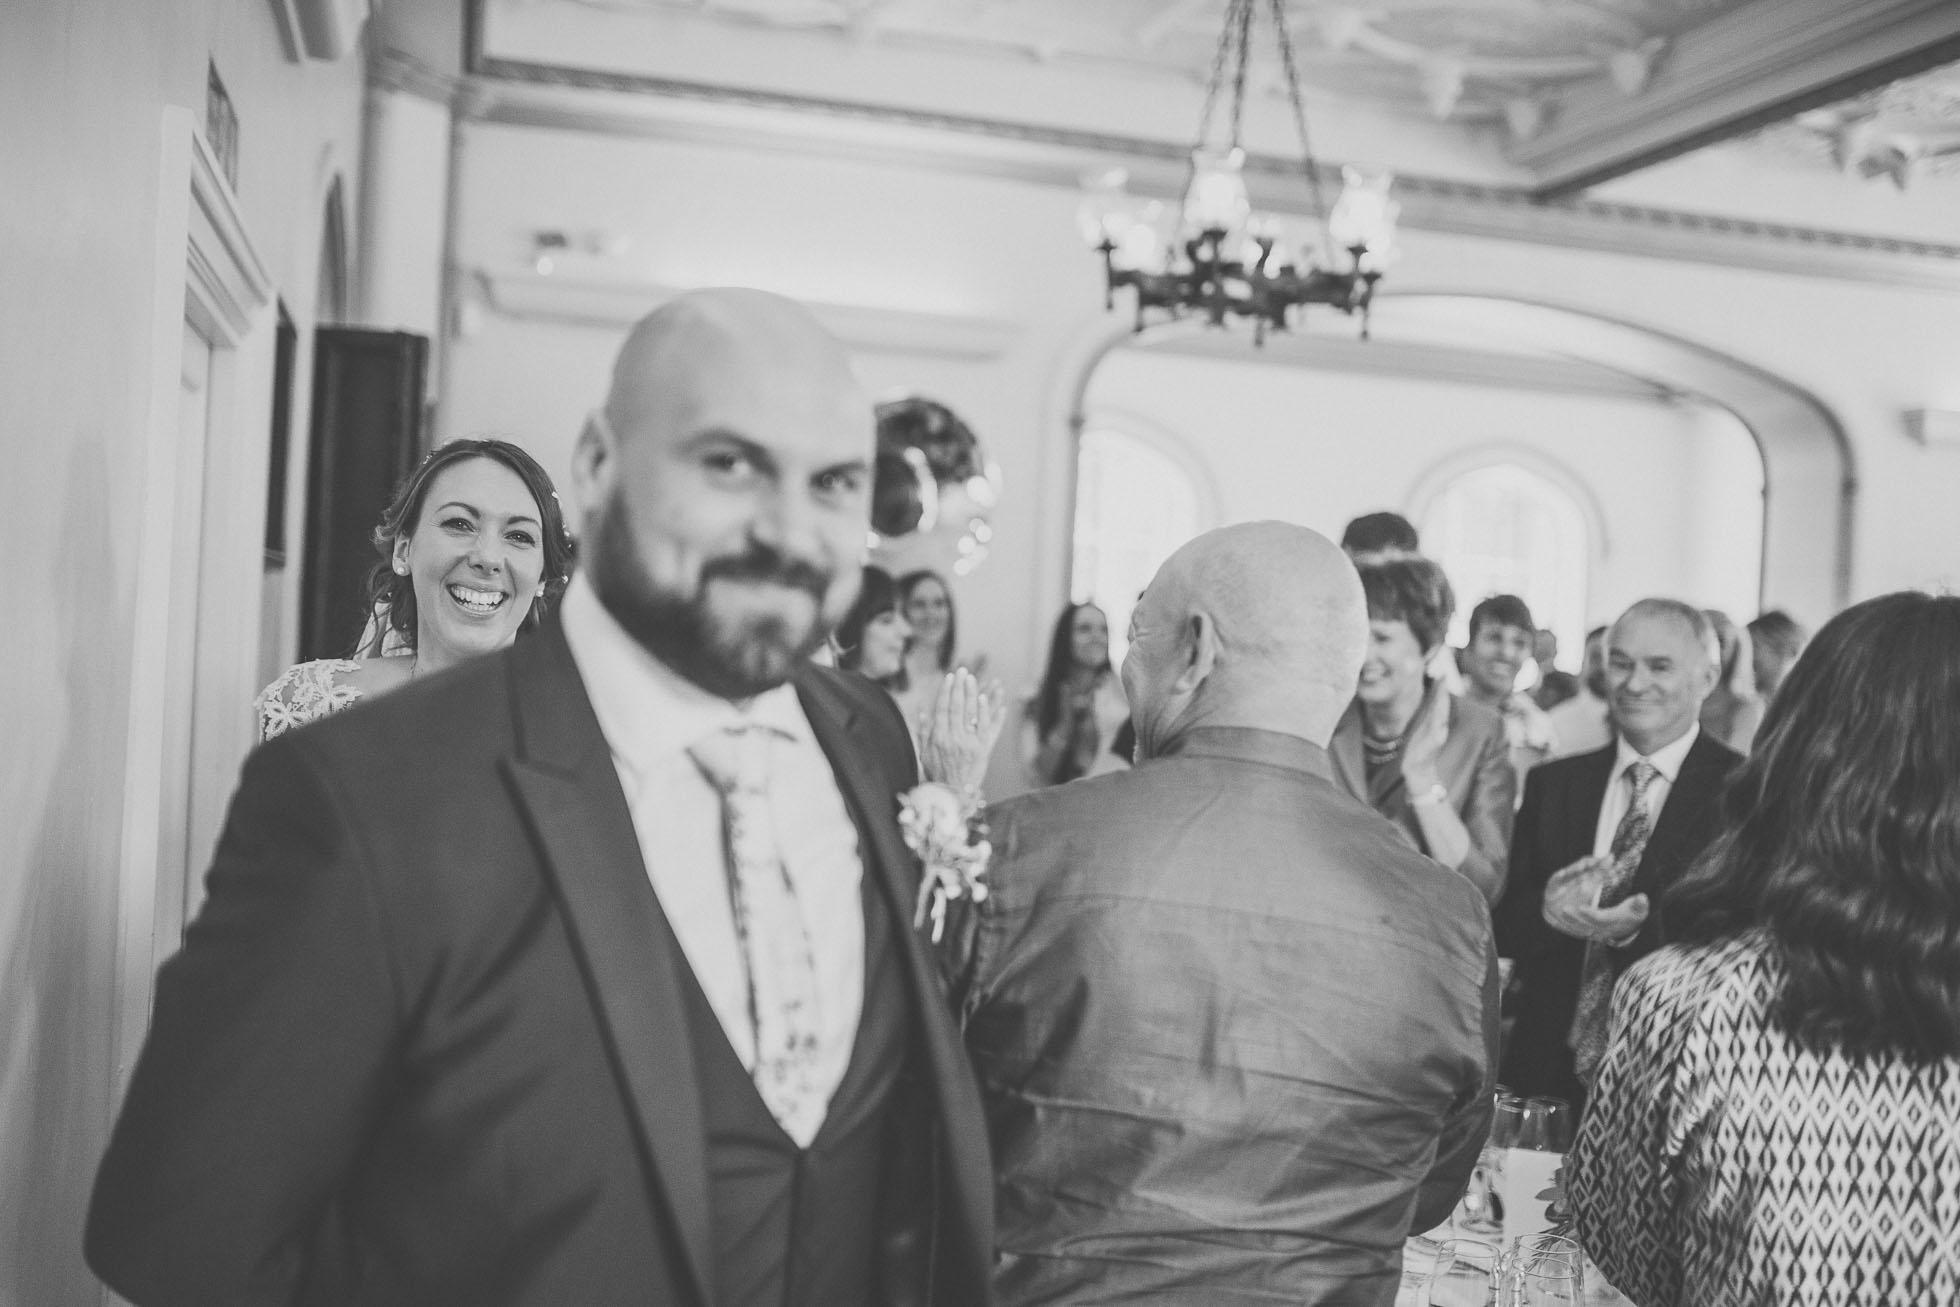 denton-hall-wedding-photographer-51.jpg